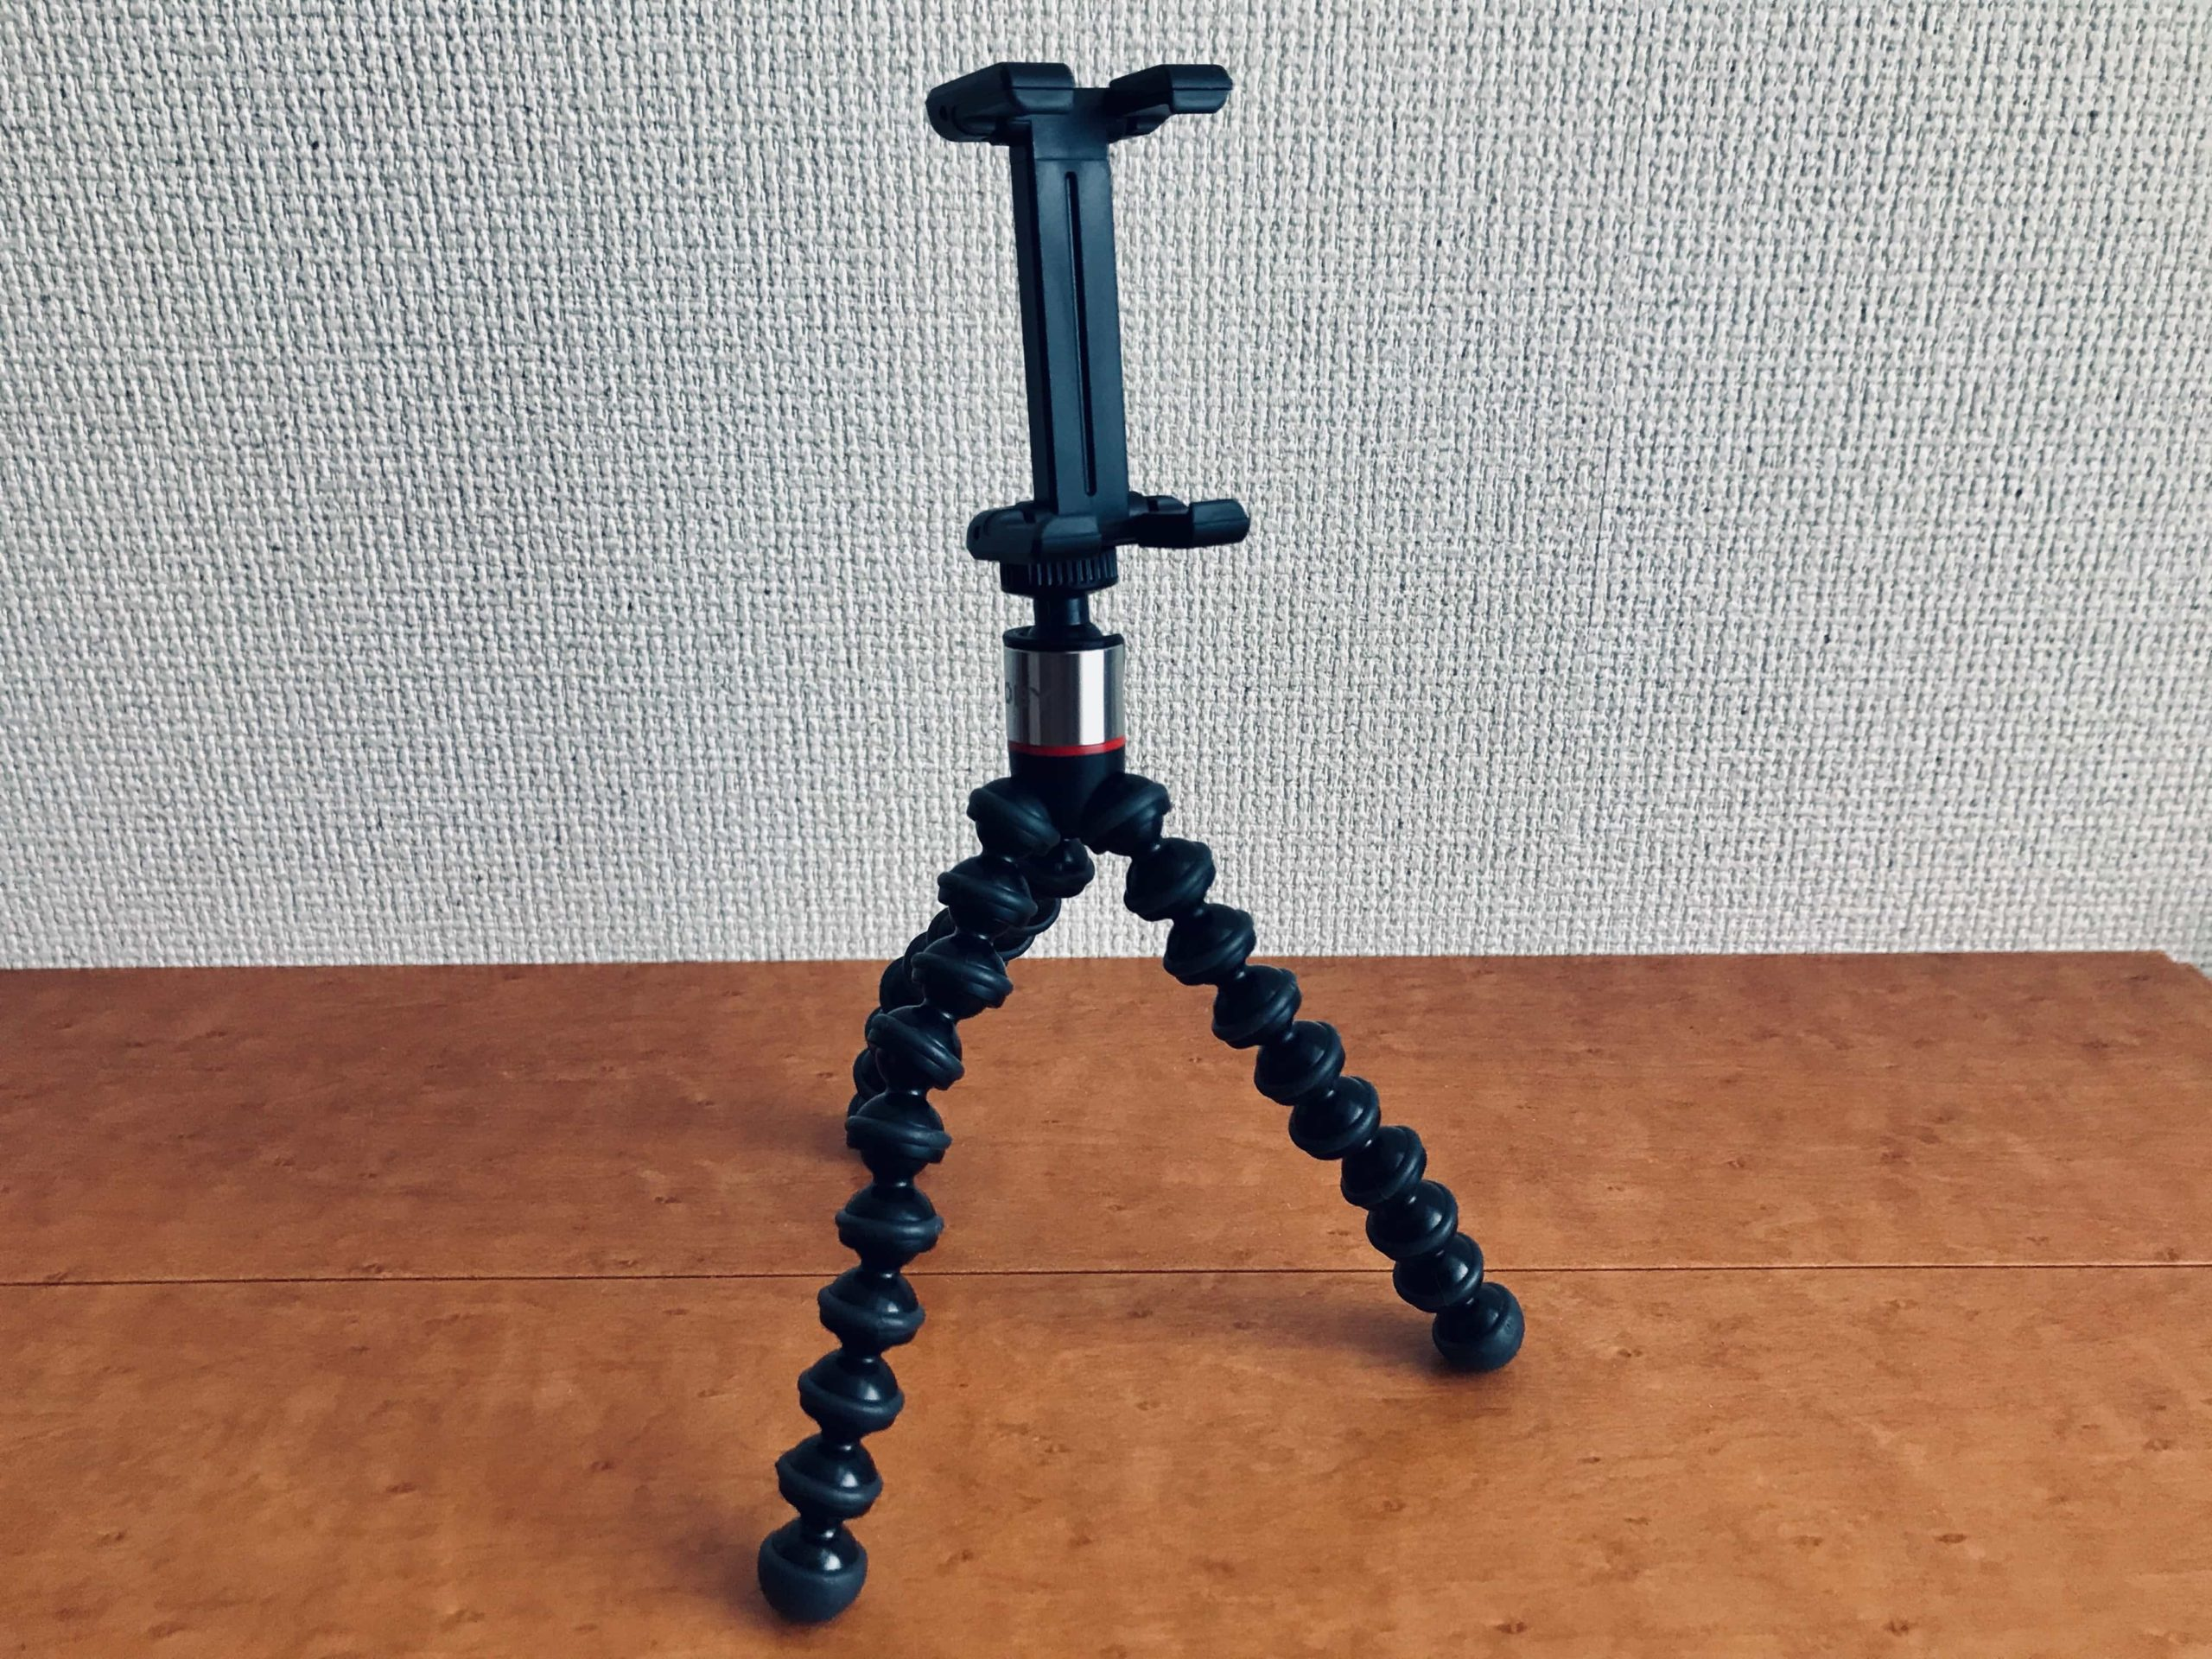 Joby GripTight One GPスタンド